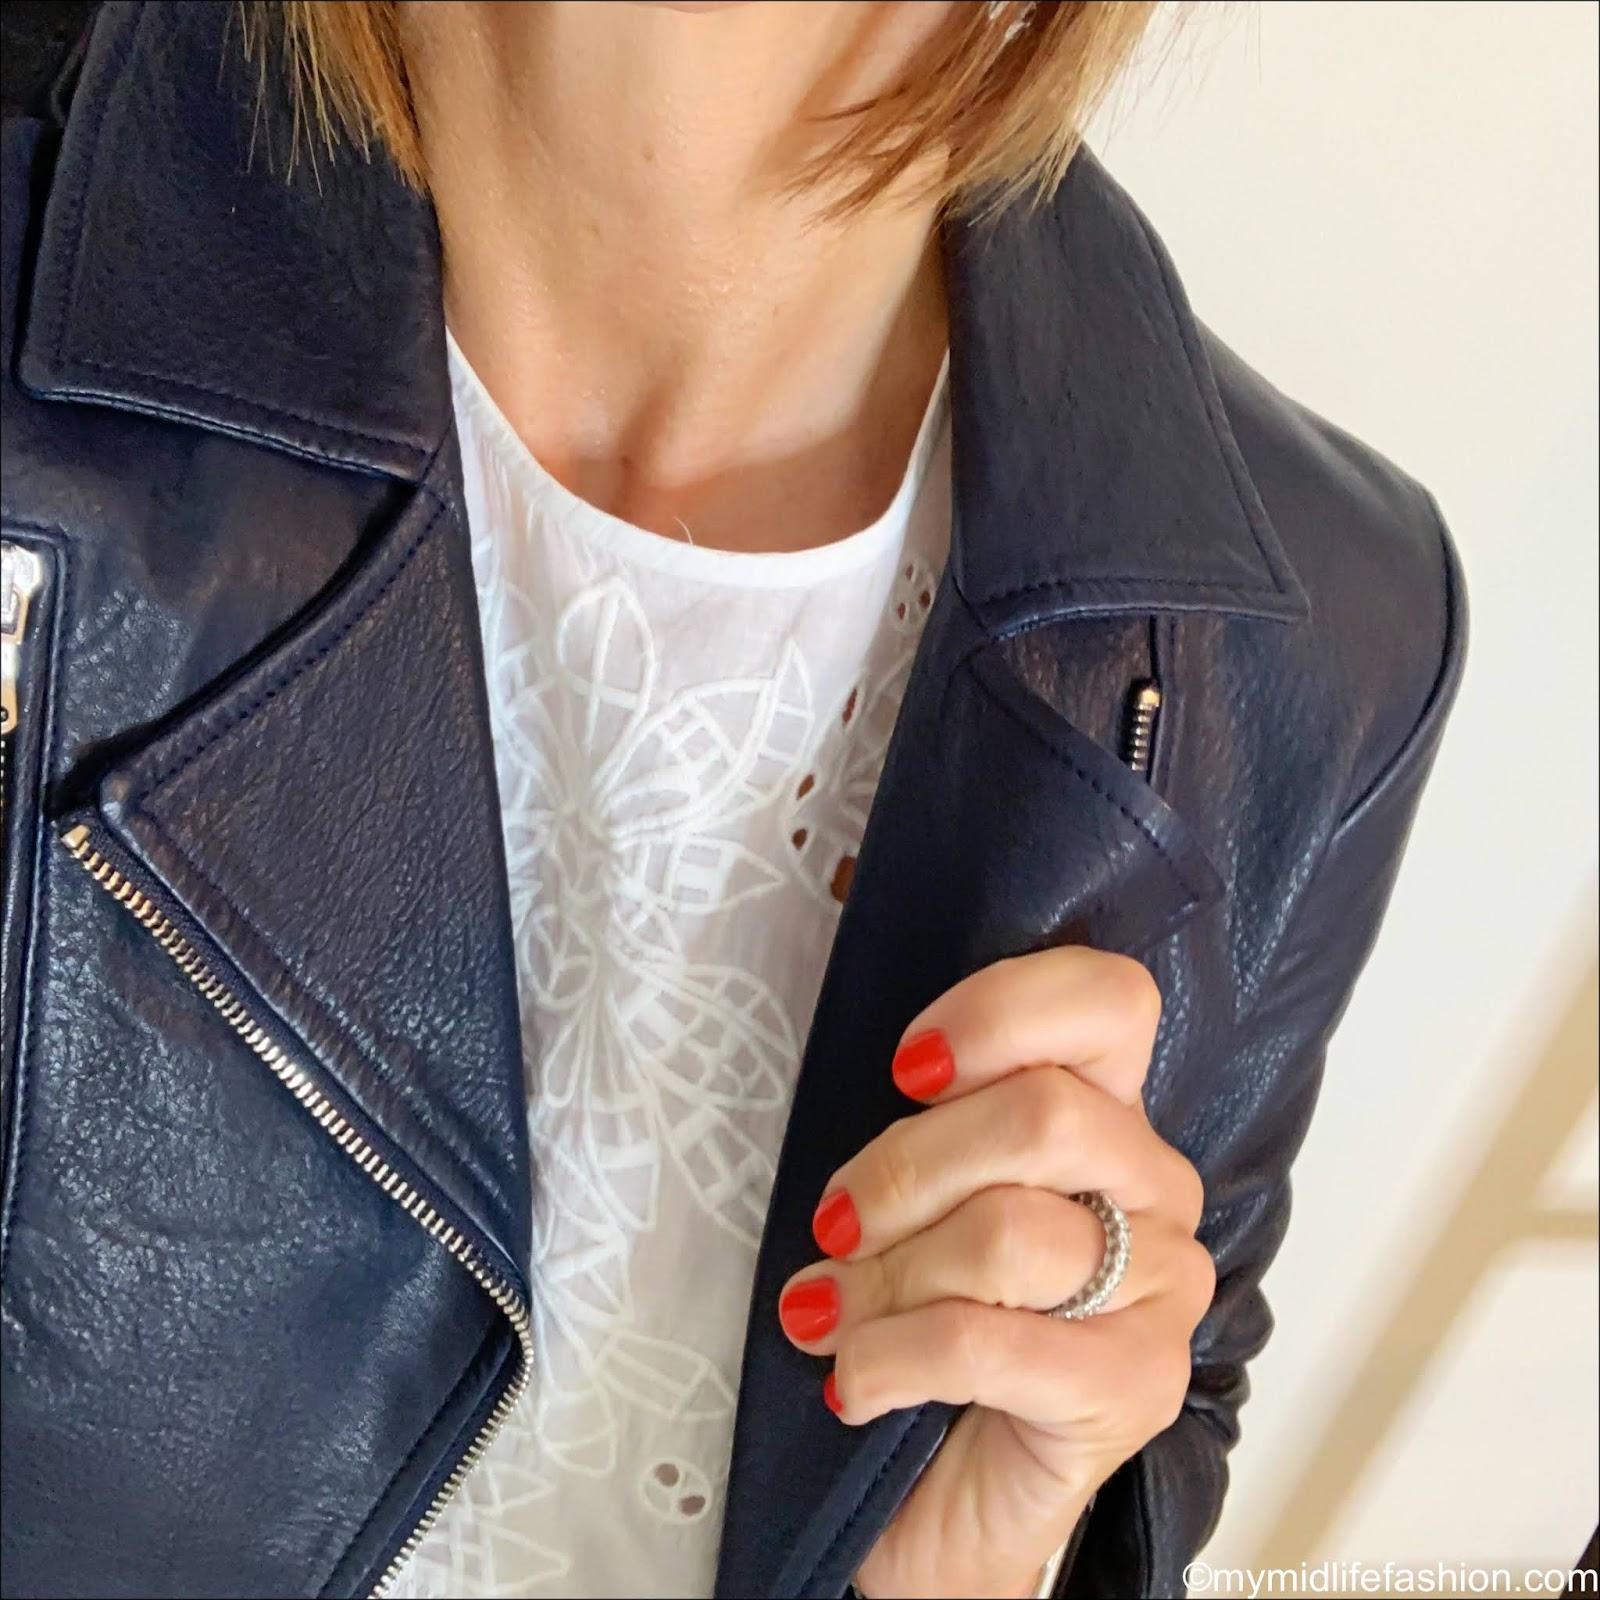 my midlife fashion, Massimo dutti leather biker jacket, Zara embroidered blouse, j crew cropped kick flare jeans, Sarah Haran hazel boho tote, Susana Cabrera Marta media luna